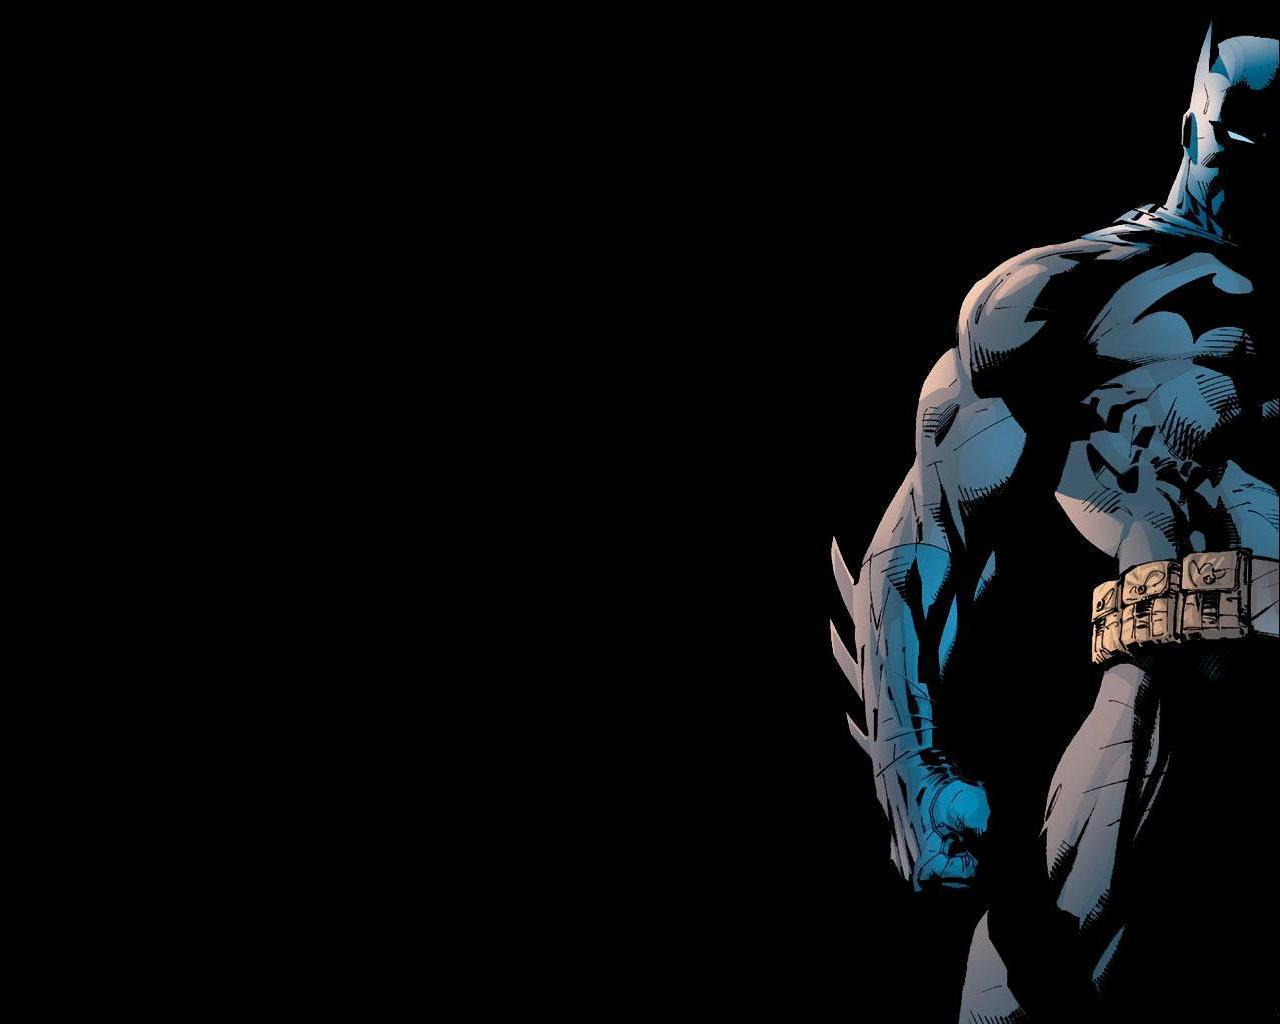 The Dark Knight. Art by Tim Sale.